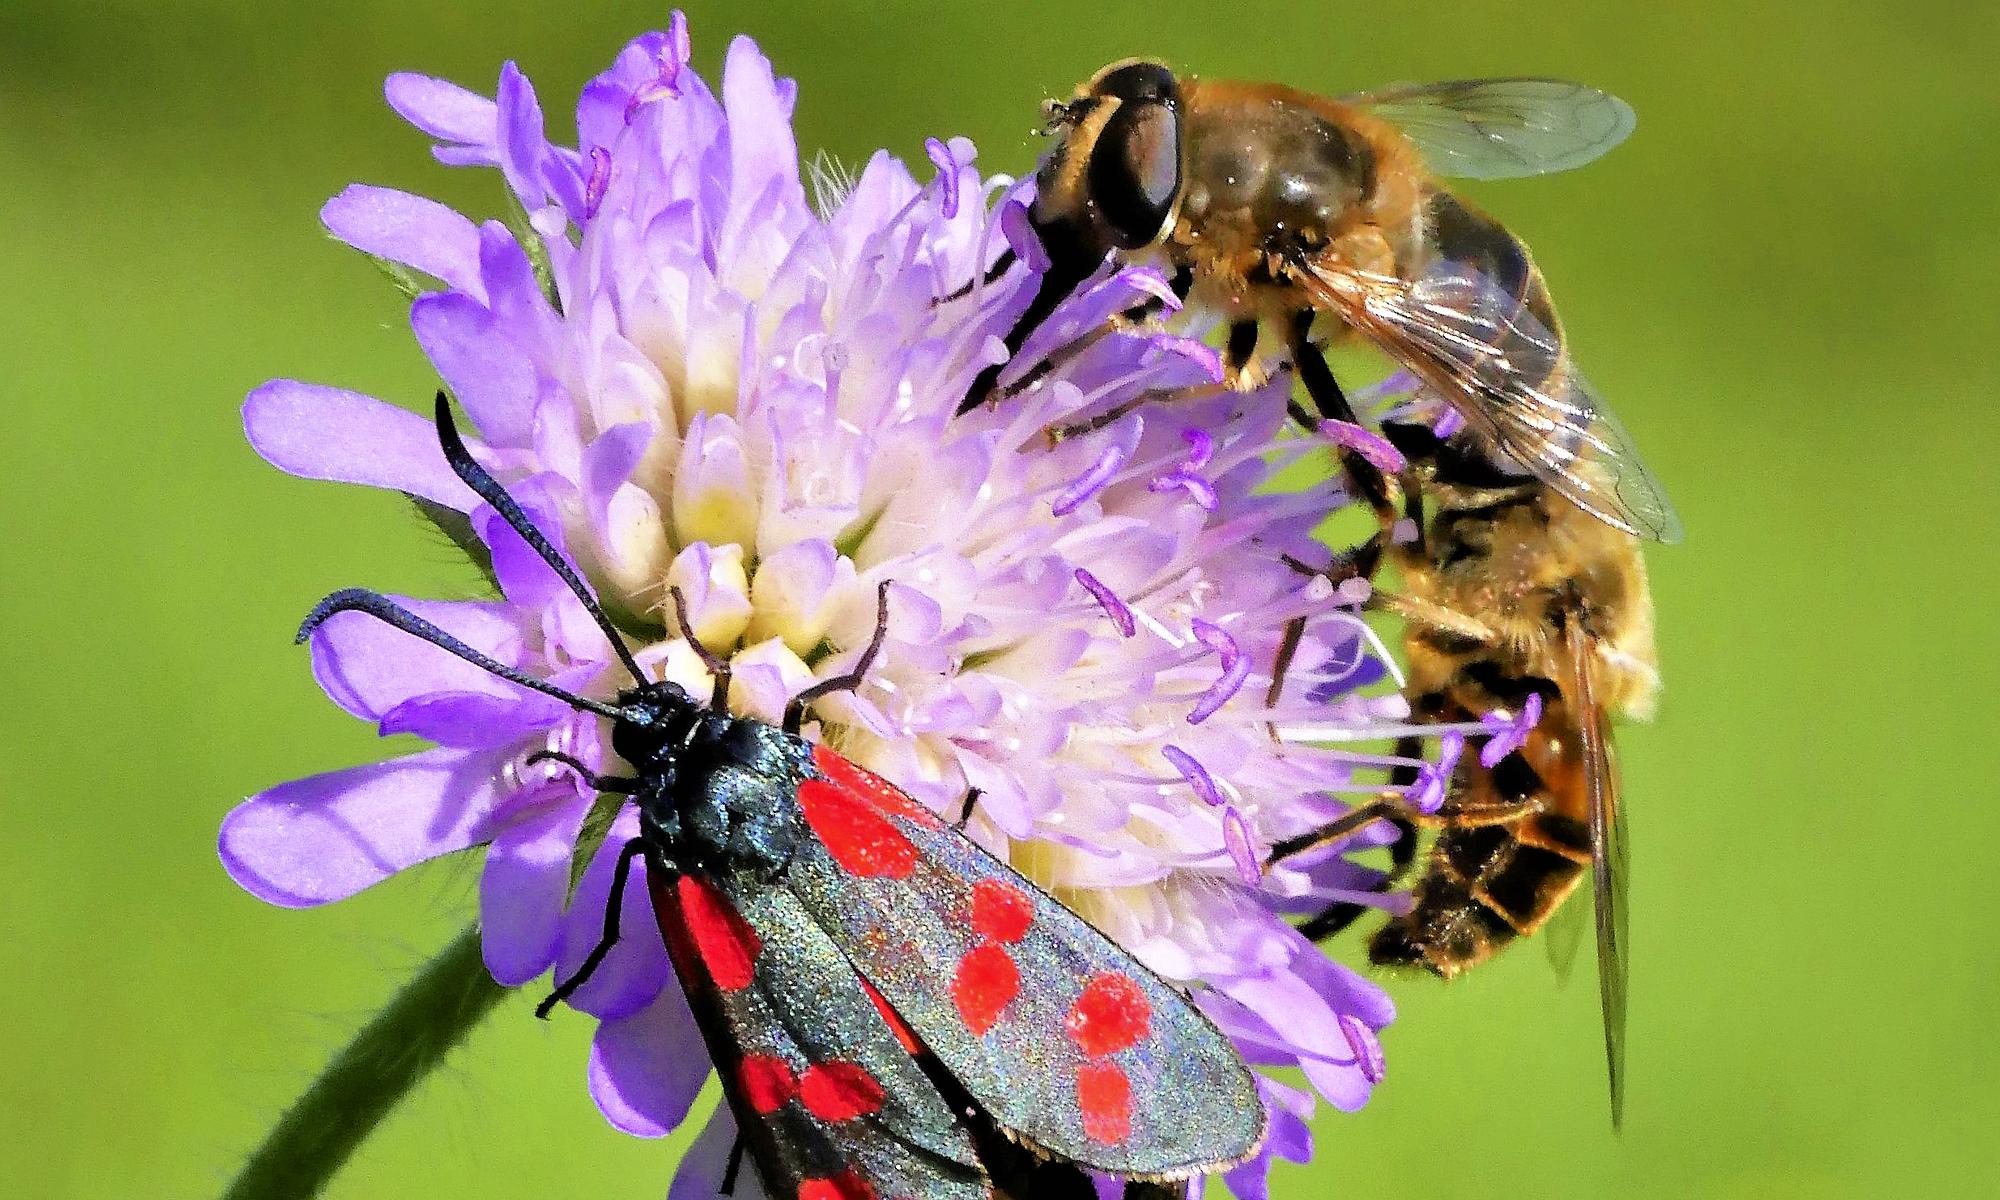 Flora und Fauna NSV Hellikon